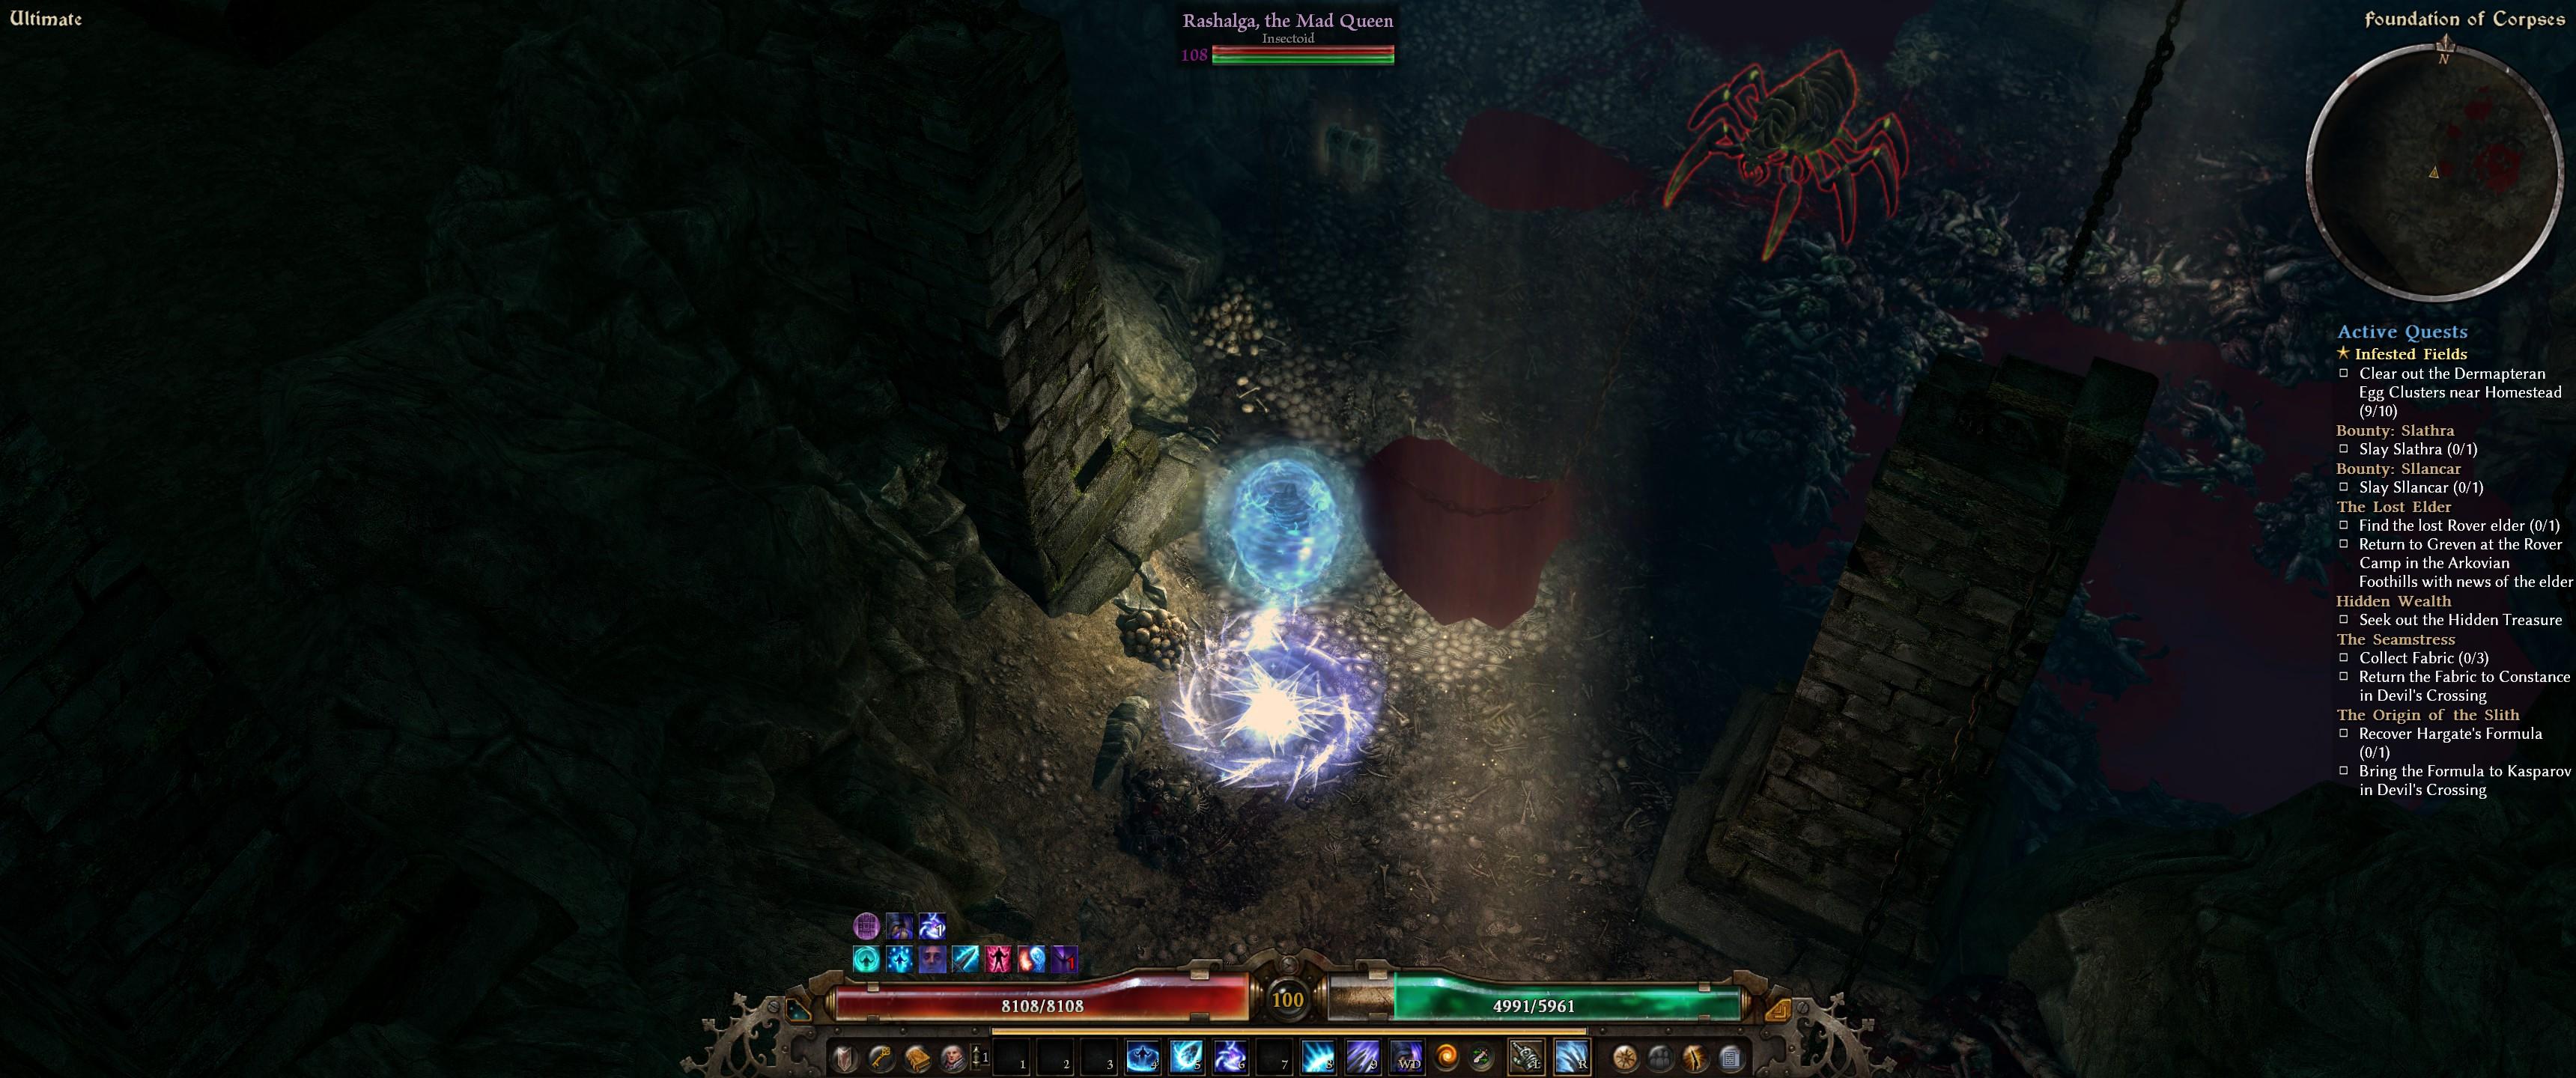 Steam Community :: Guide :: [1 1 2 2] Freeza's Tanky